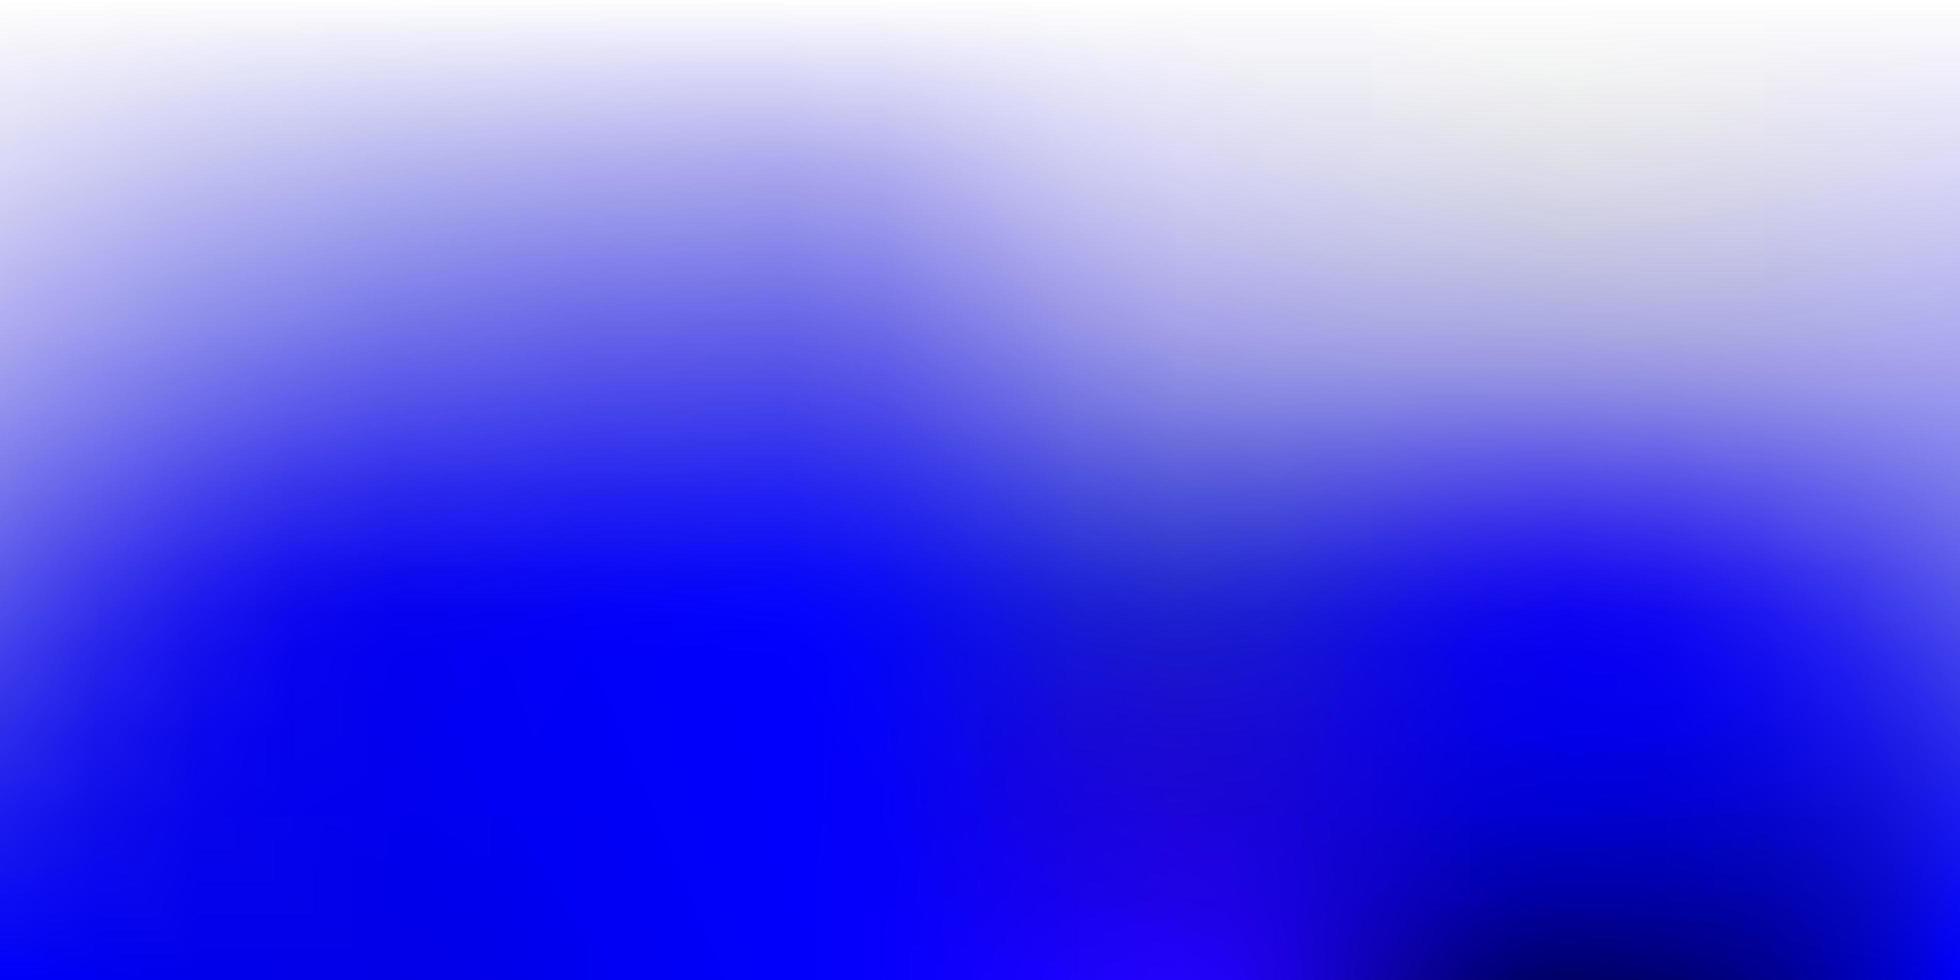 Dark BLUE vector blur backdrop.